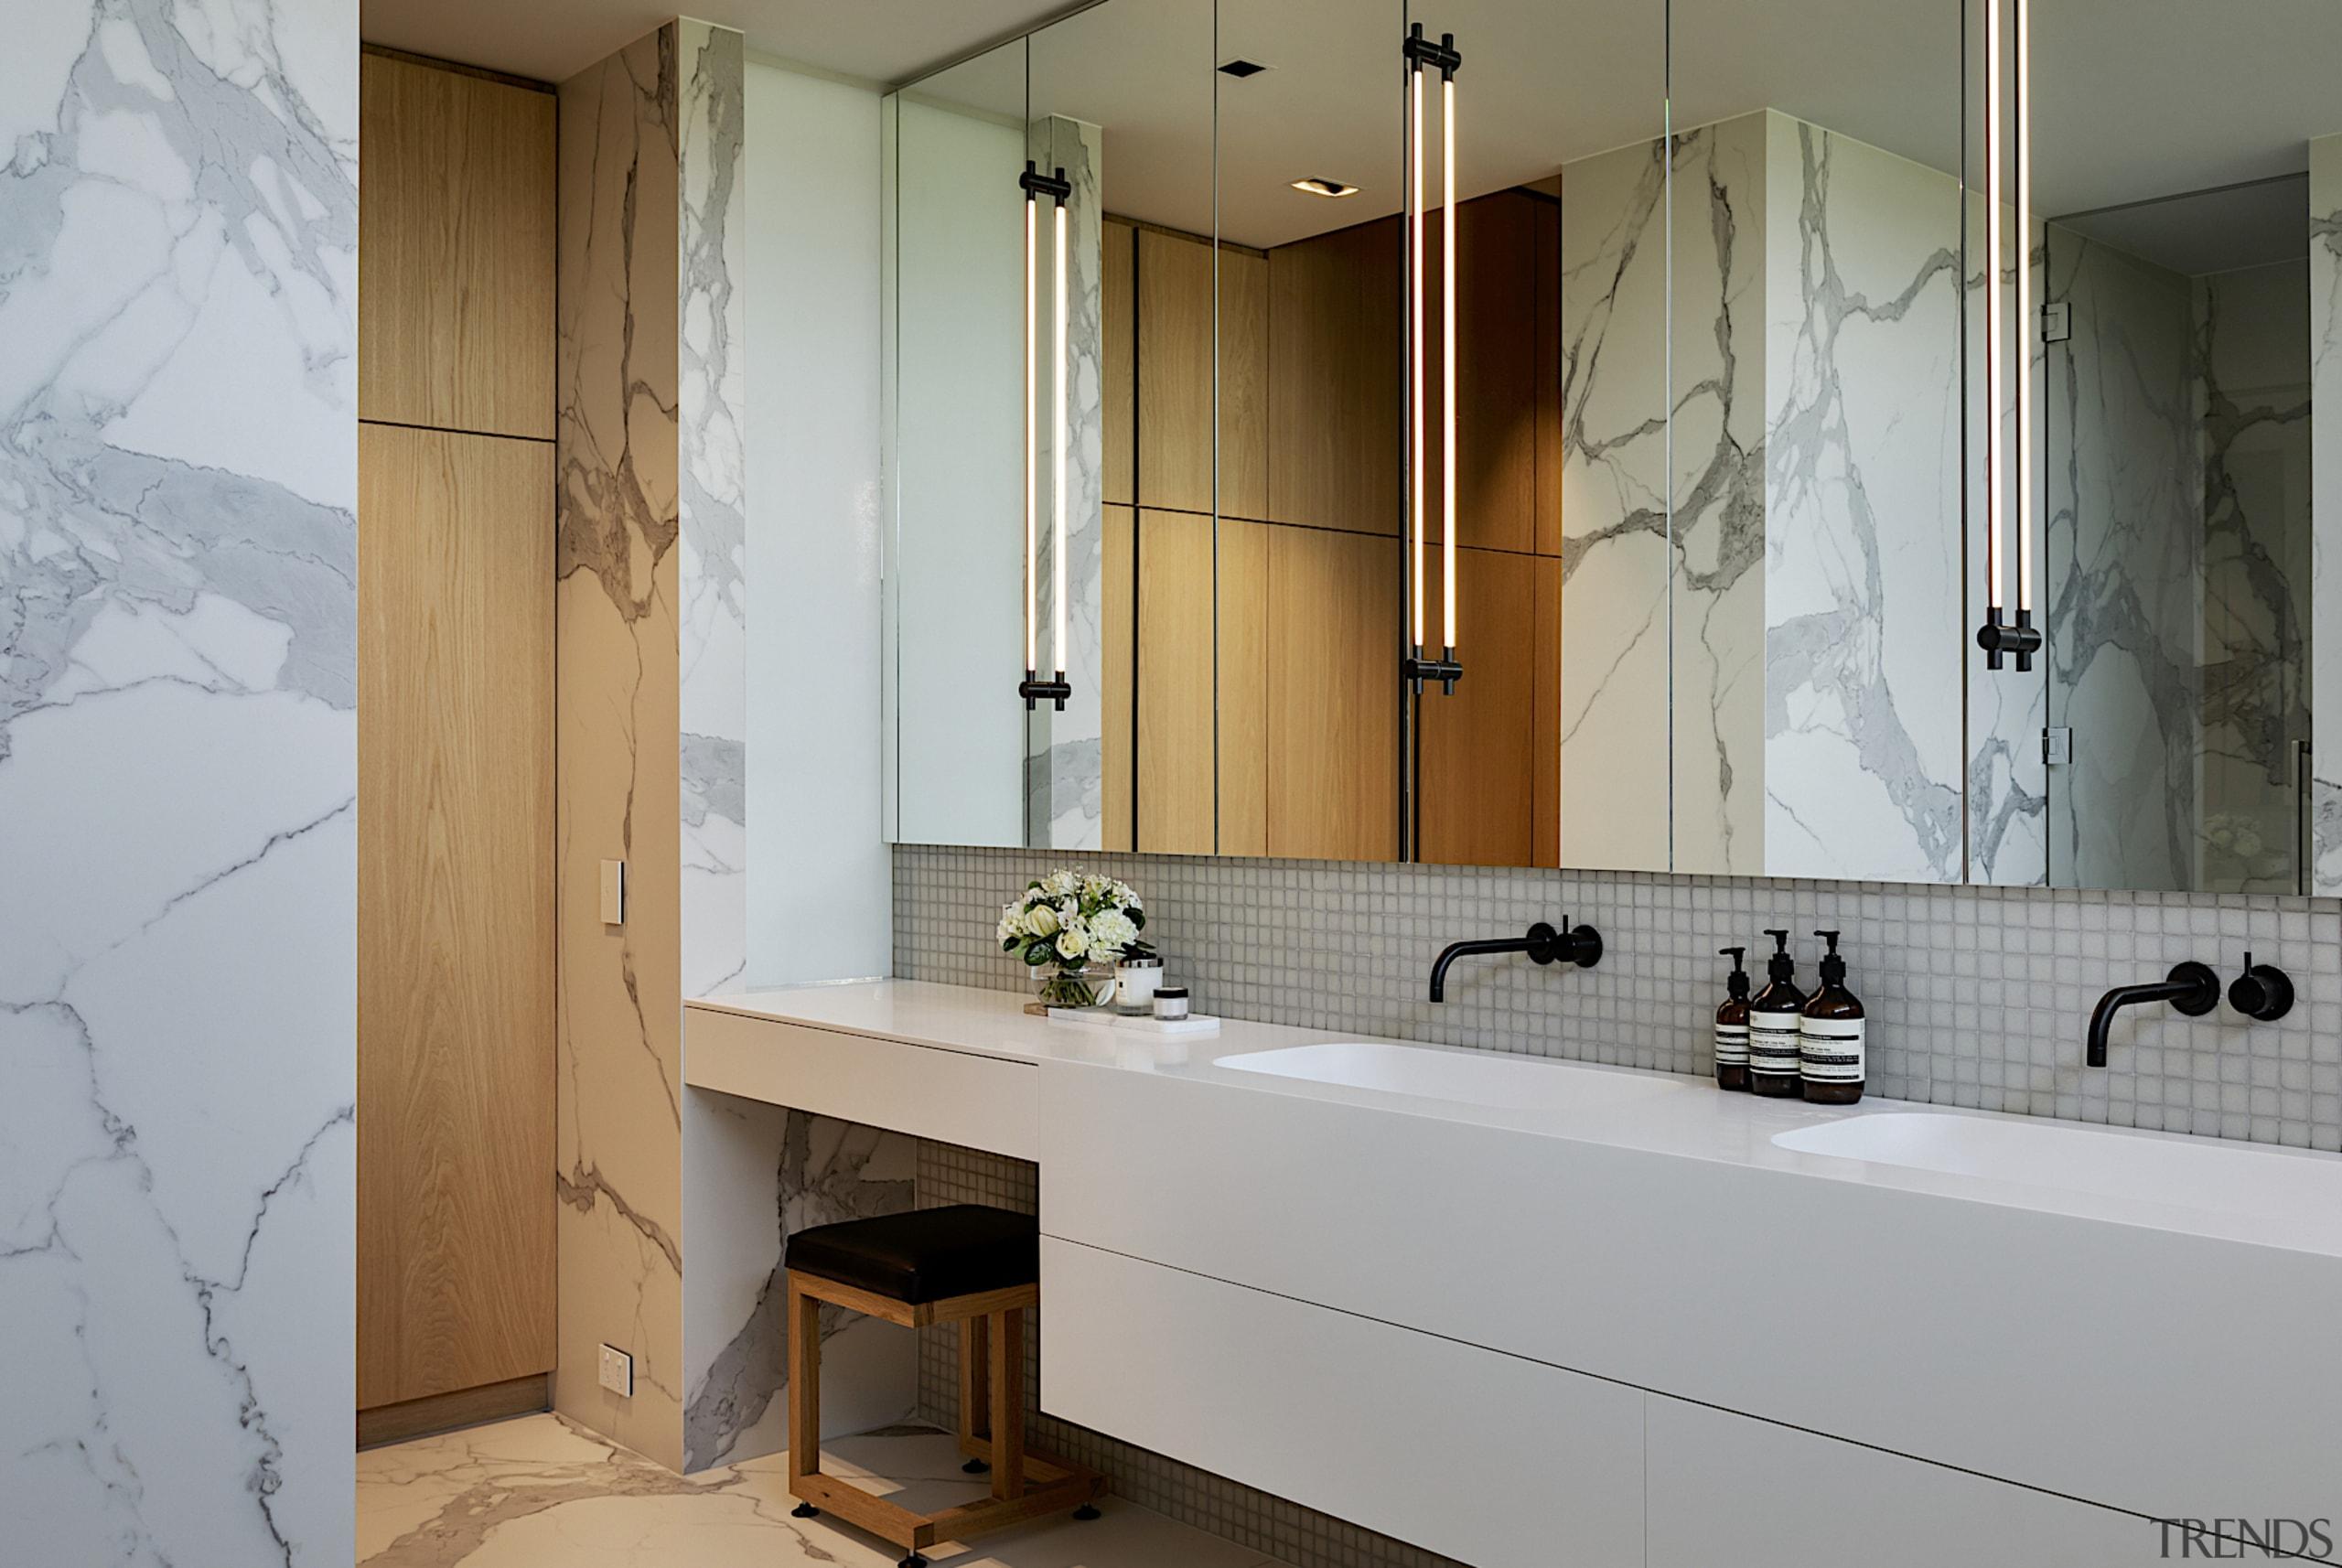 The design concept for this elegant suite was